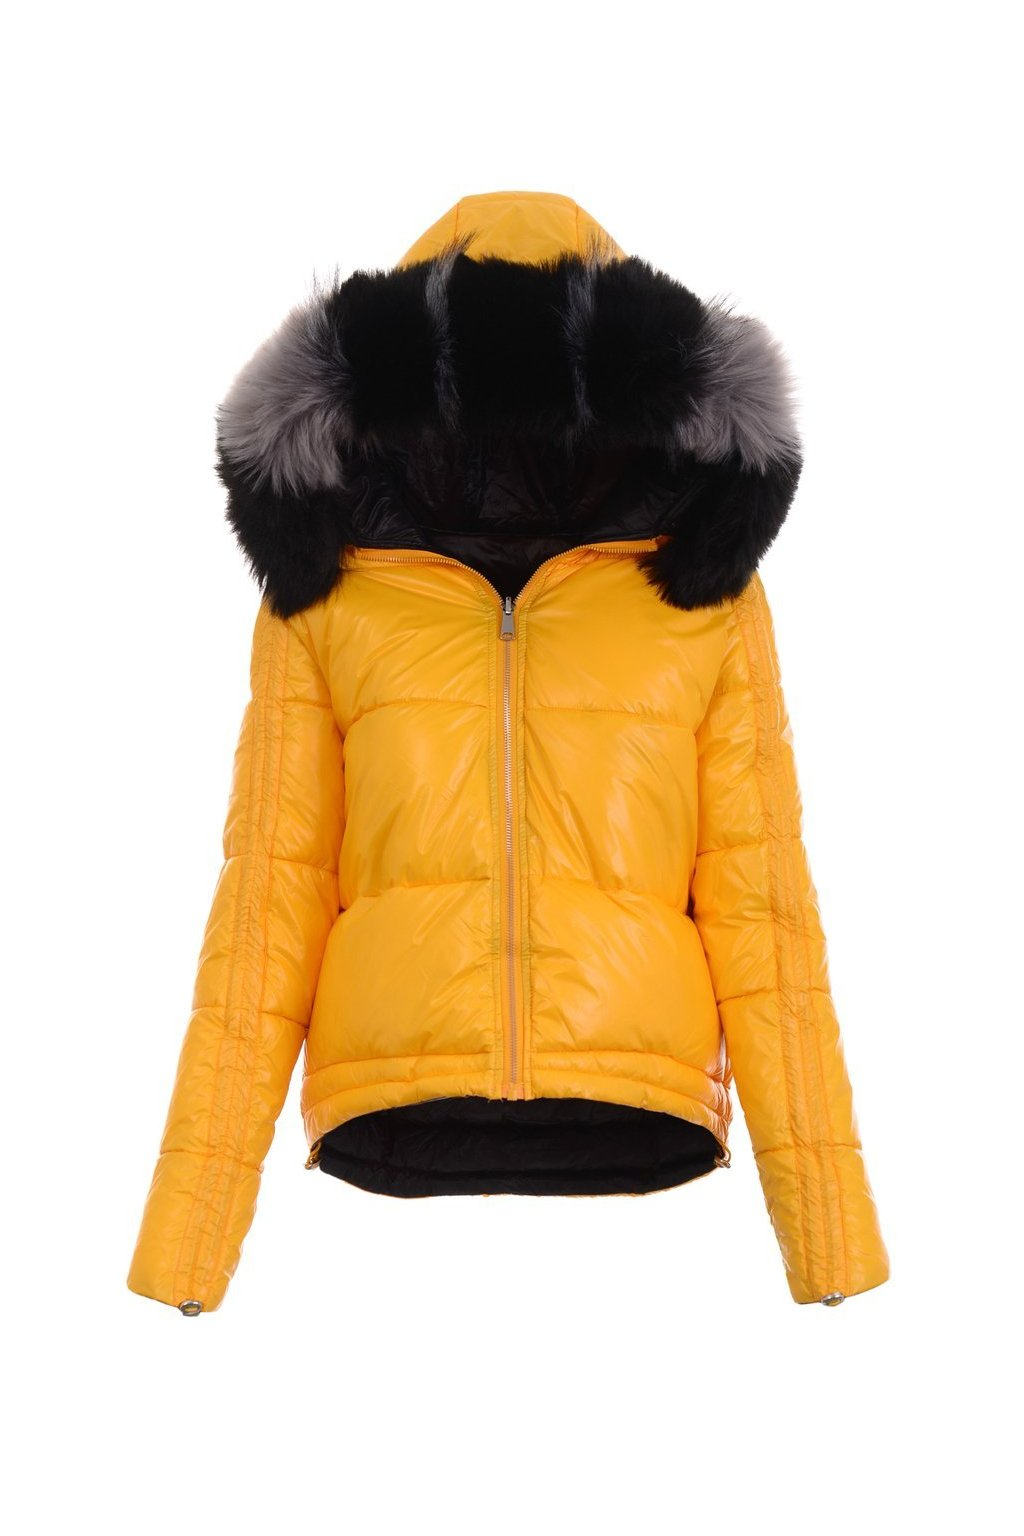 Dámska zimná bunda s kapucňou 4763 žltá